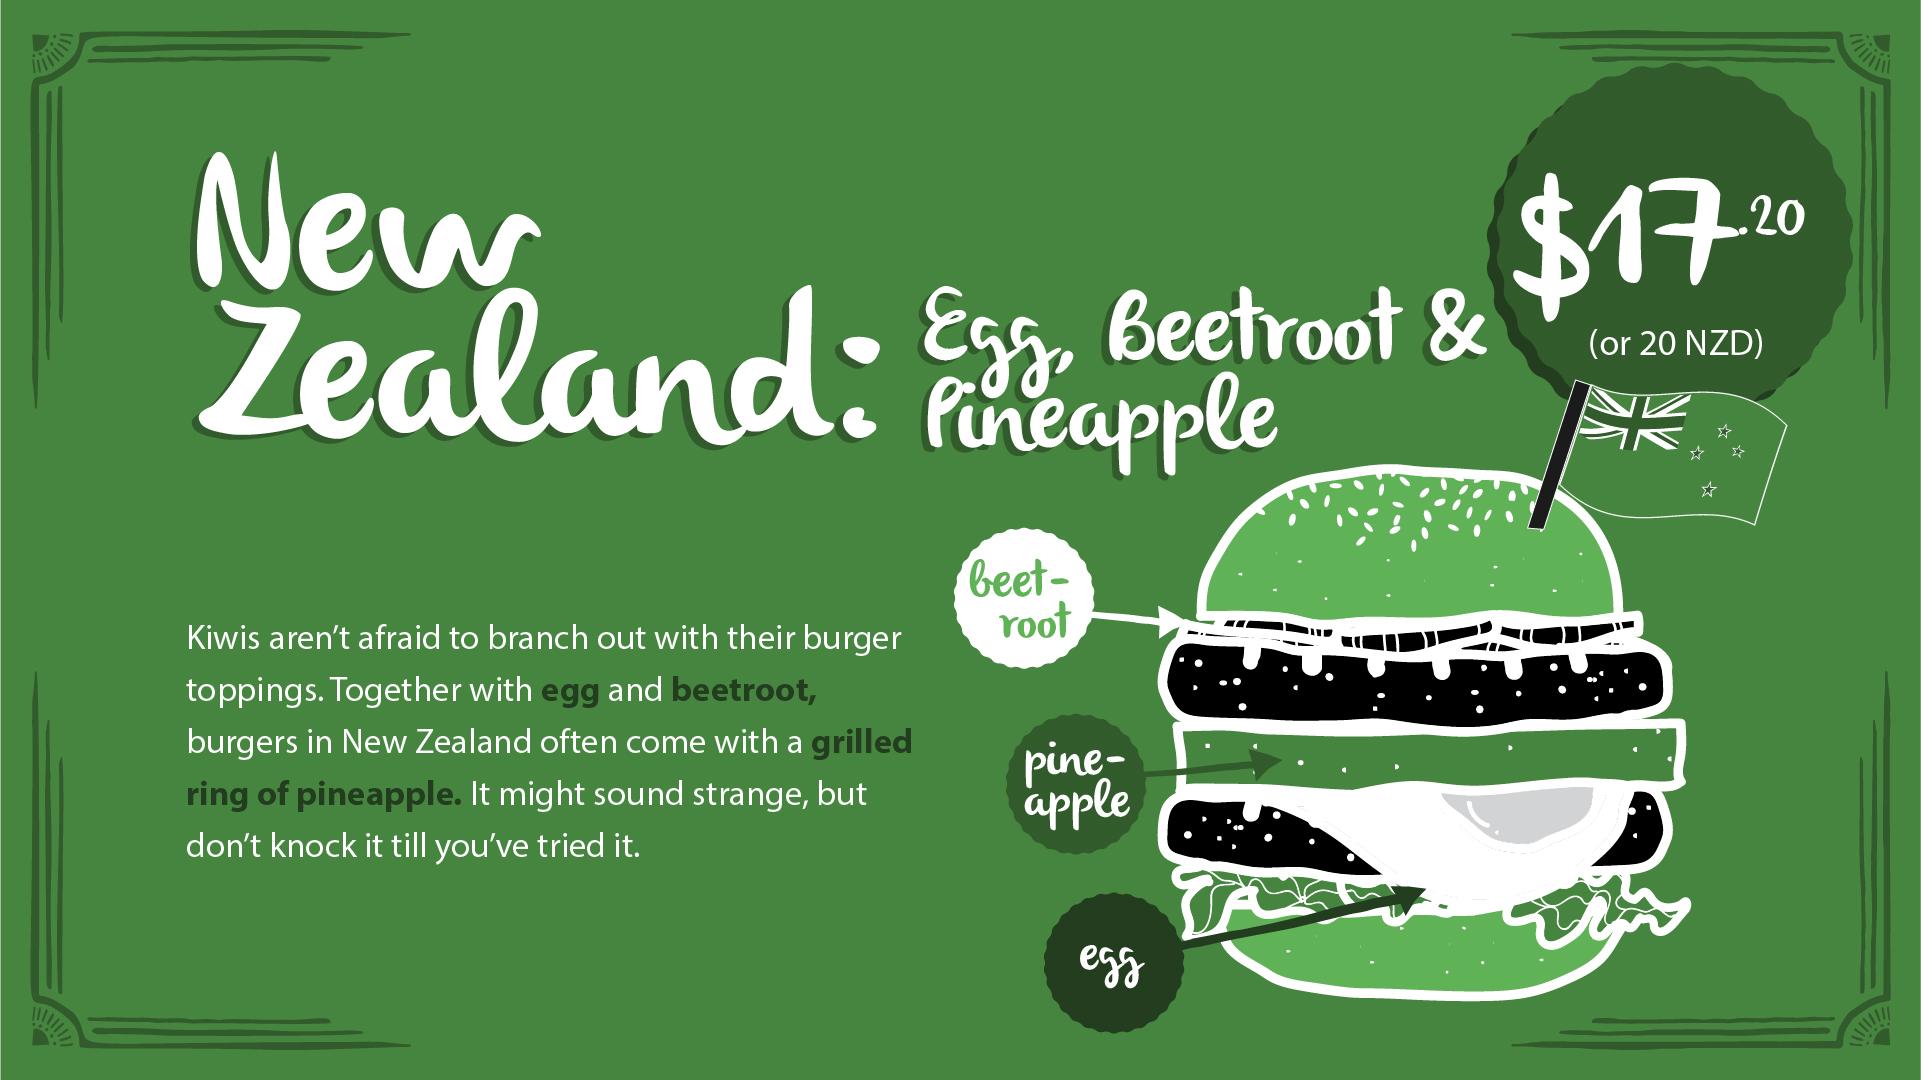 New Zealand burger